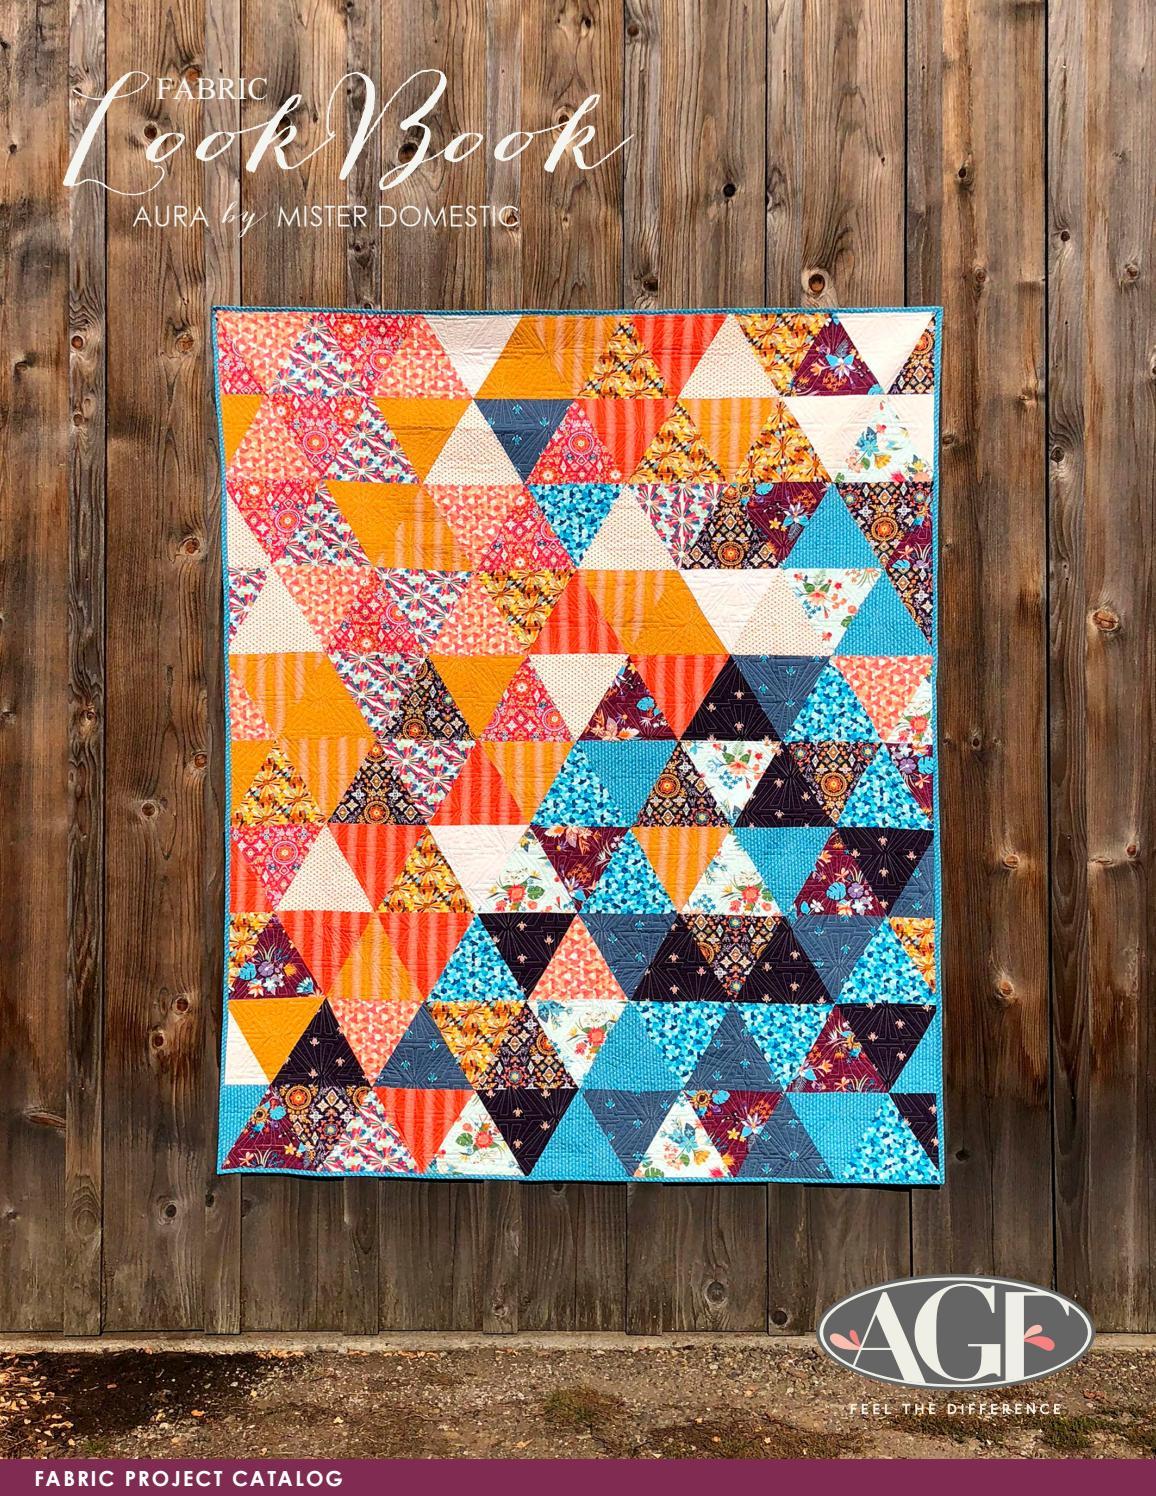 AURA by Mister Domestic by Art Gallery Fabrics - issuu